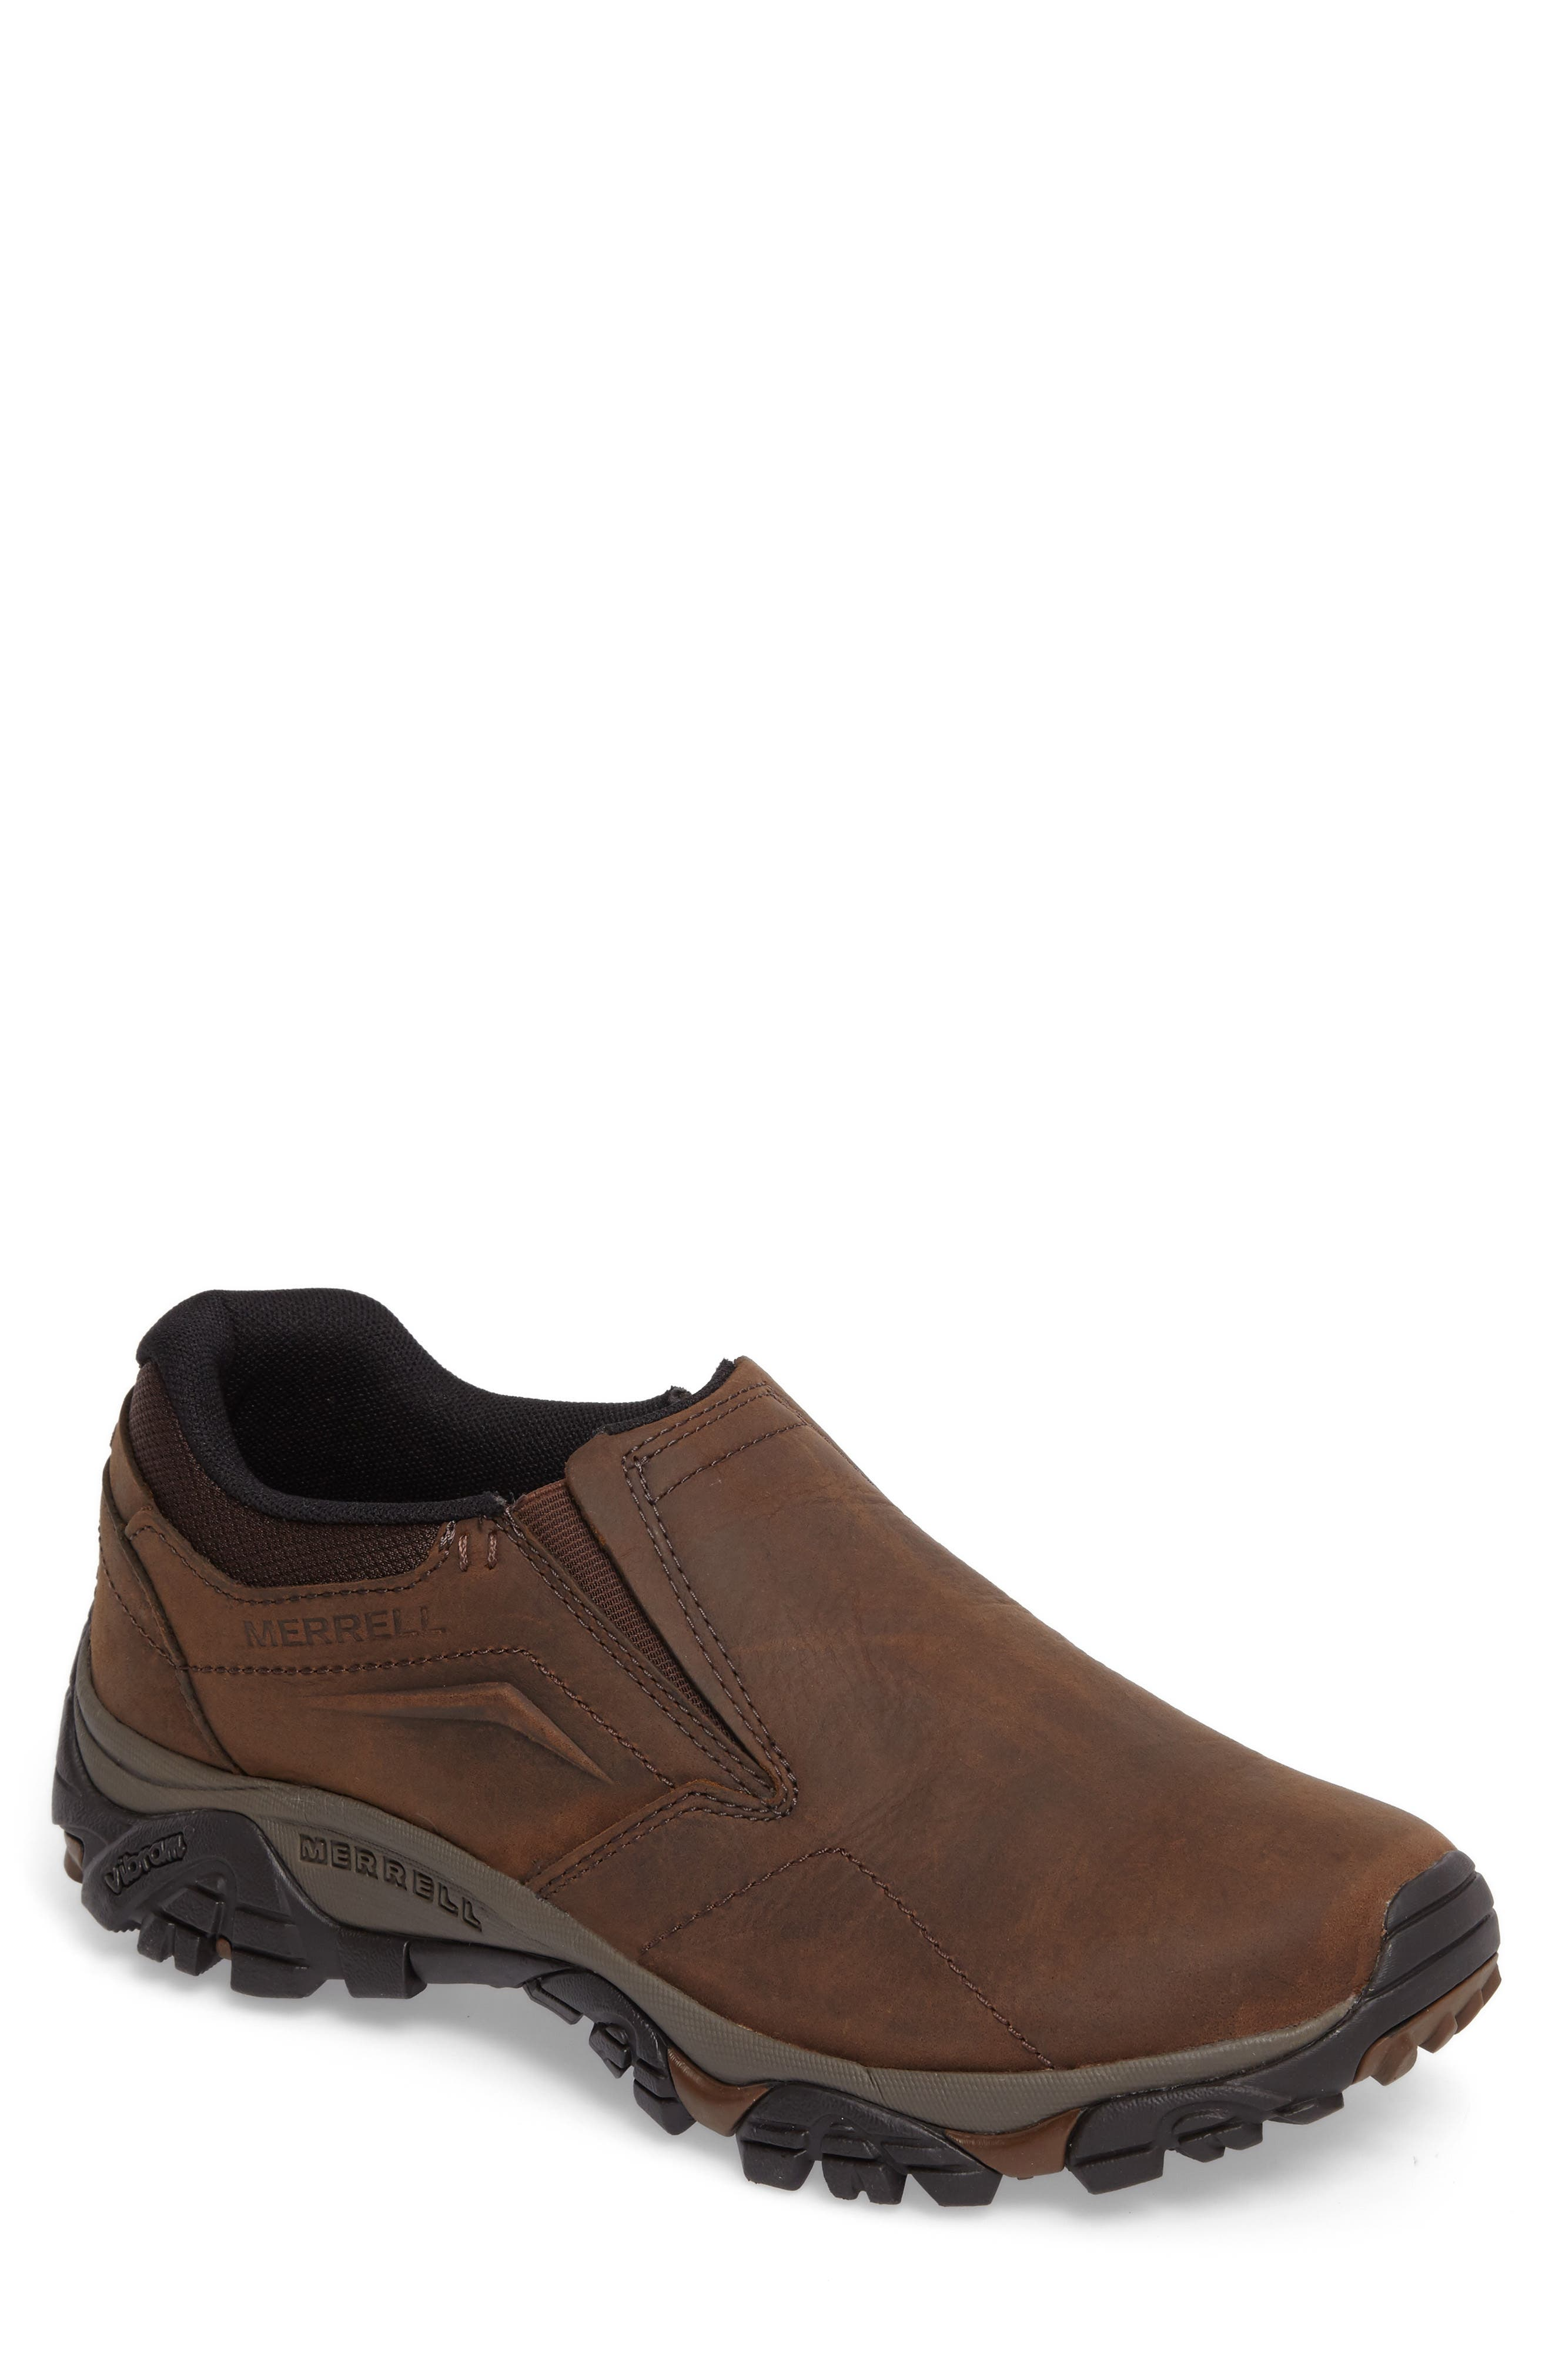 Merrell Moab Adventure Hiking Shoe (Men)